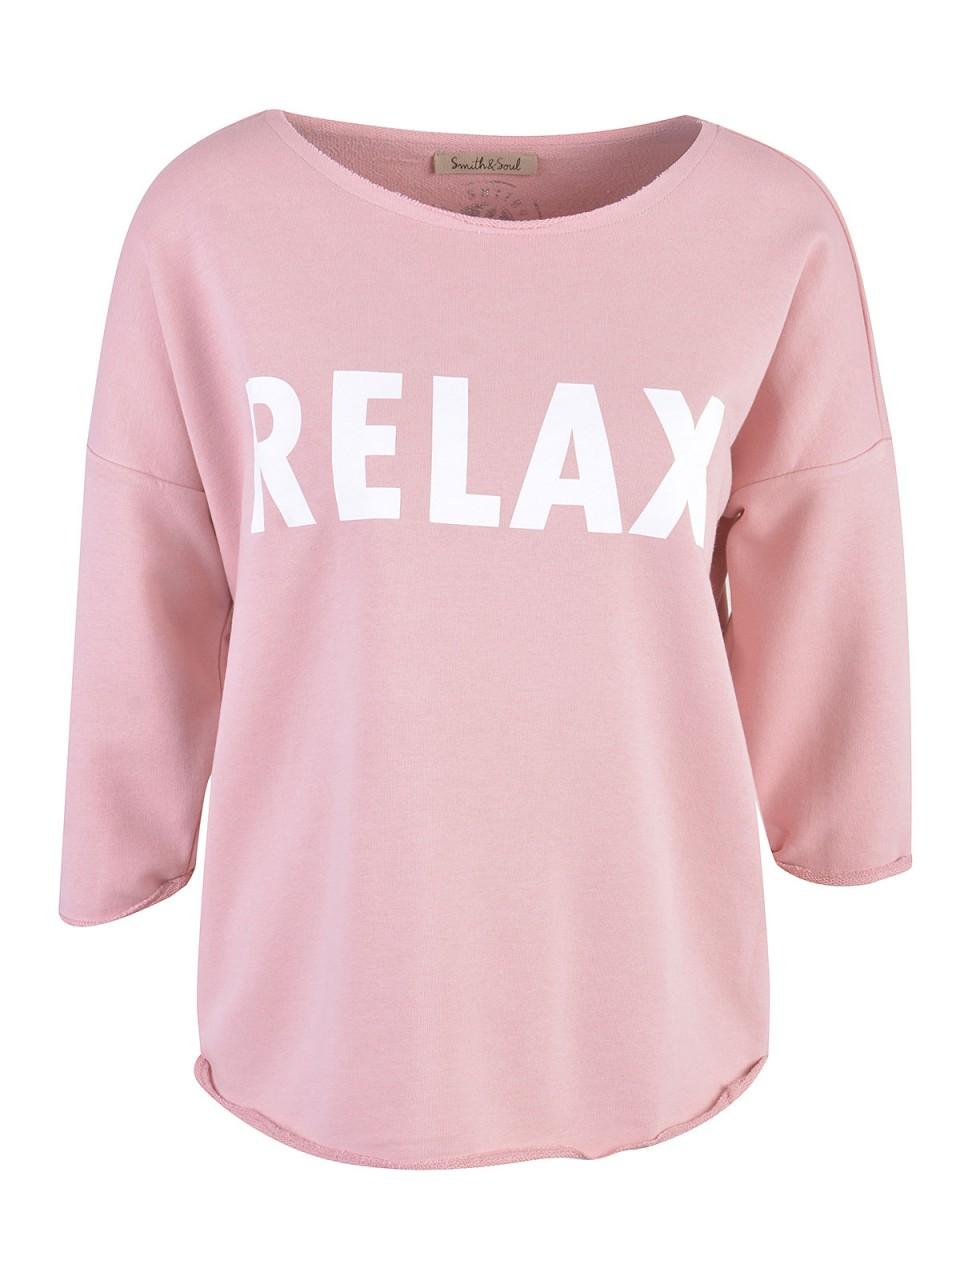 Oberteile - SMITH SOUL Damen Sweatshirt, rosa  - Onlineshop Designermode.com